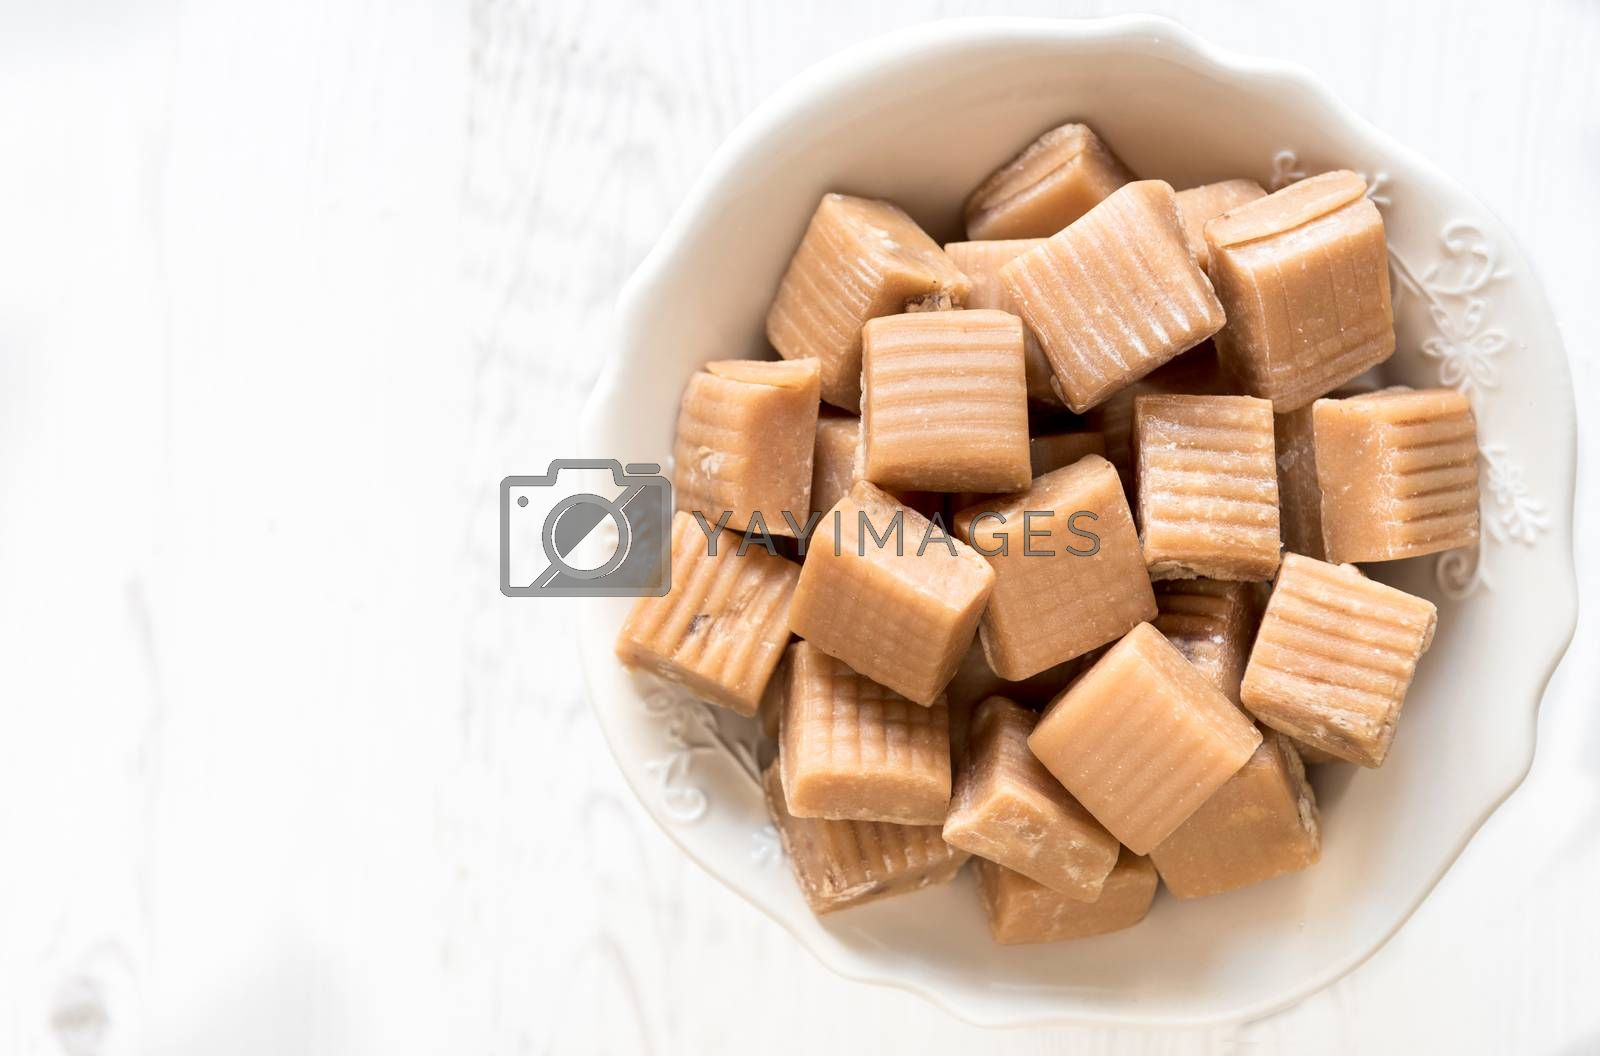 Sweet homemade milk and caramle bonbons,selective focus